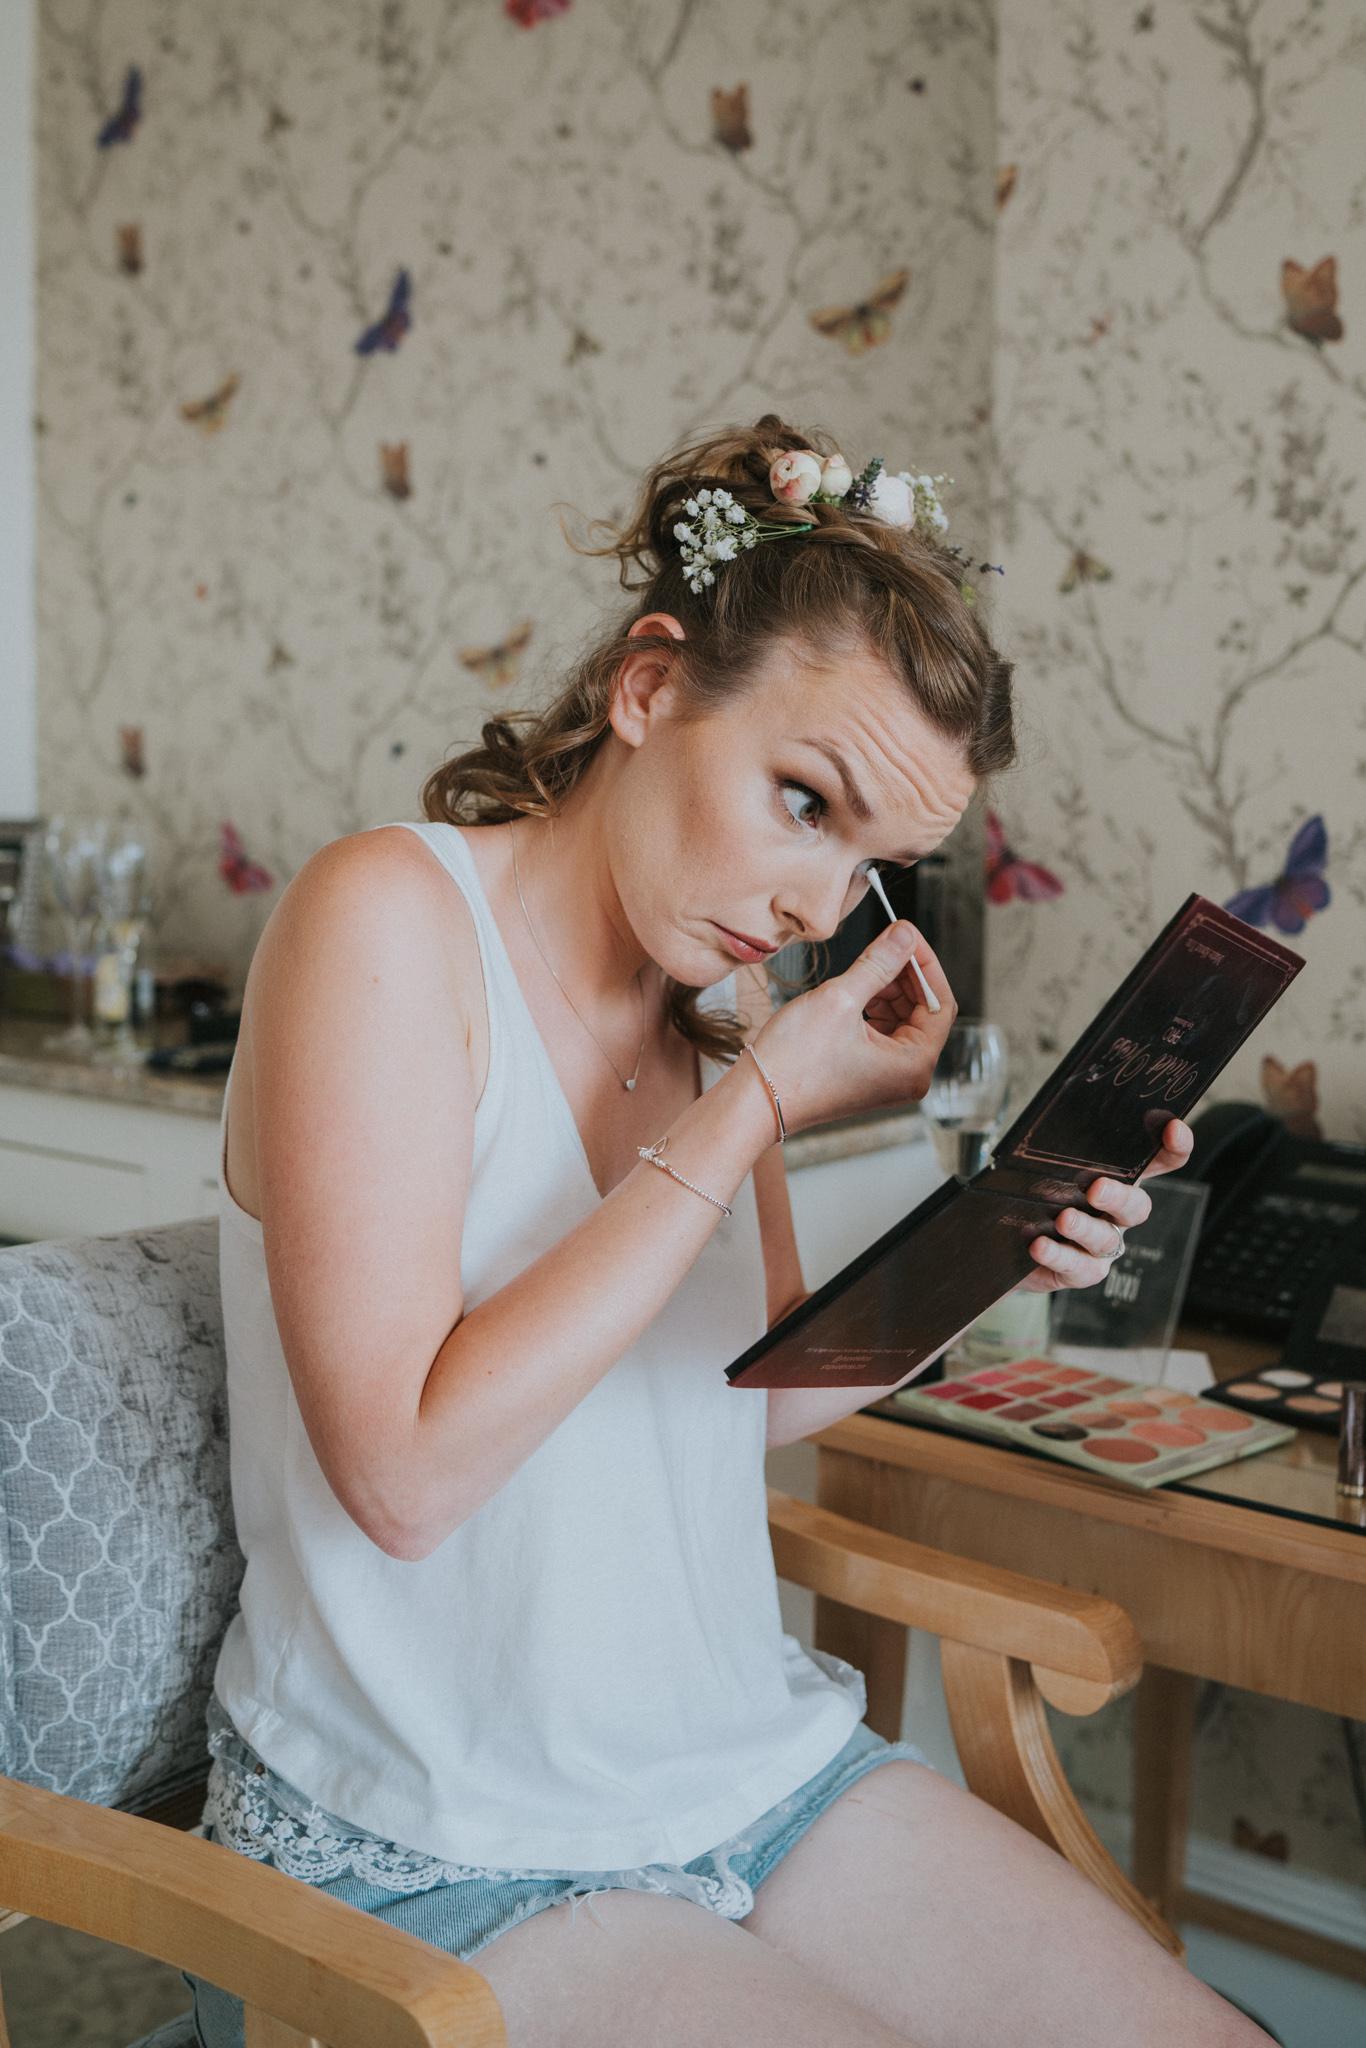 Grace-Elizabeth-Georgie-Amalaketu-Firstsite-Colchester-Essex-Boho-Buddhist-Wedding-Alternative-Wedding-Photography-Essex (12 of 100).jpg